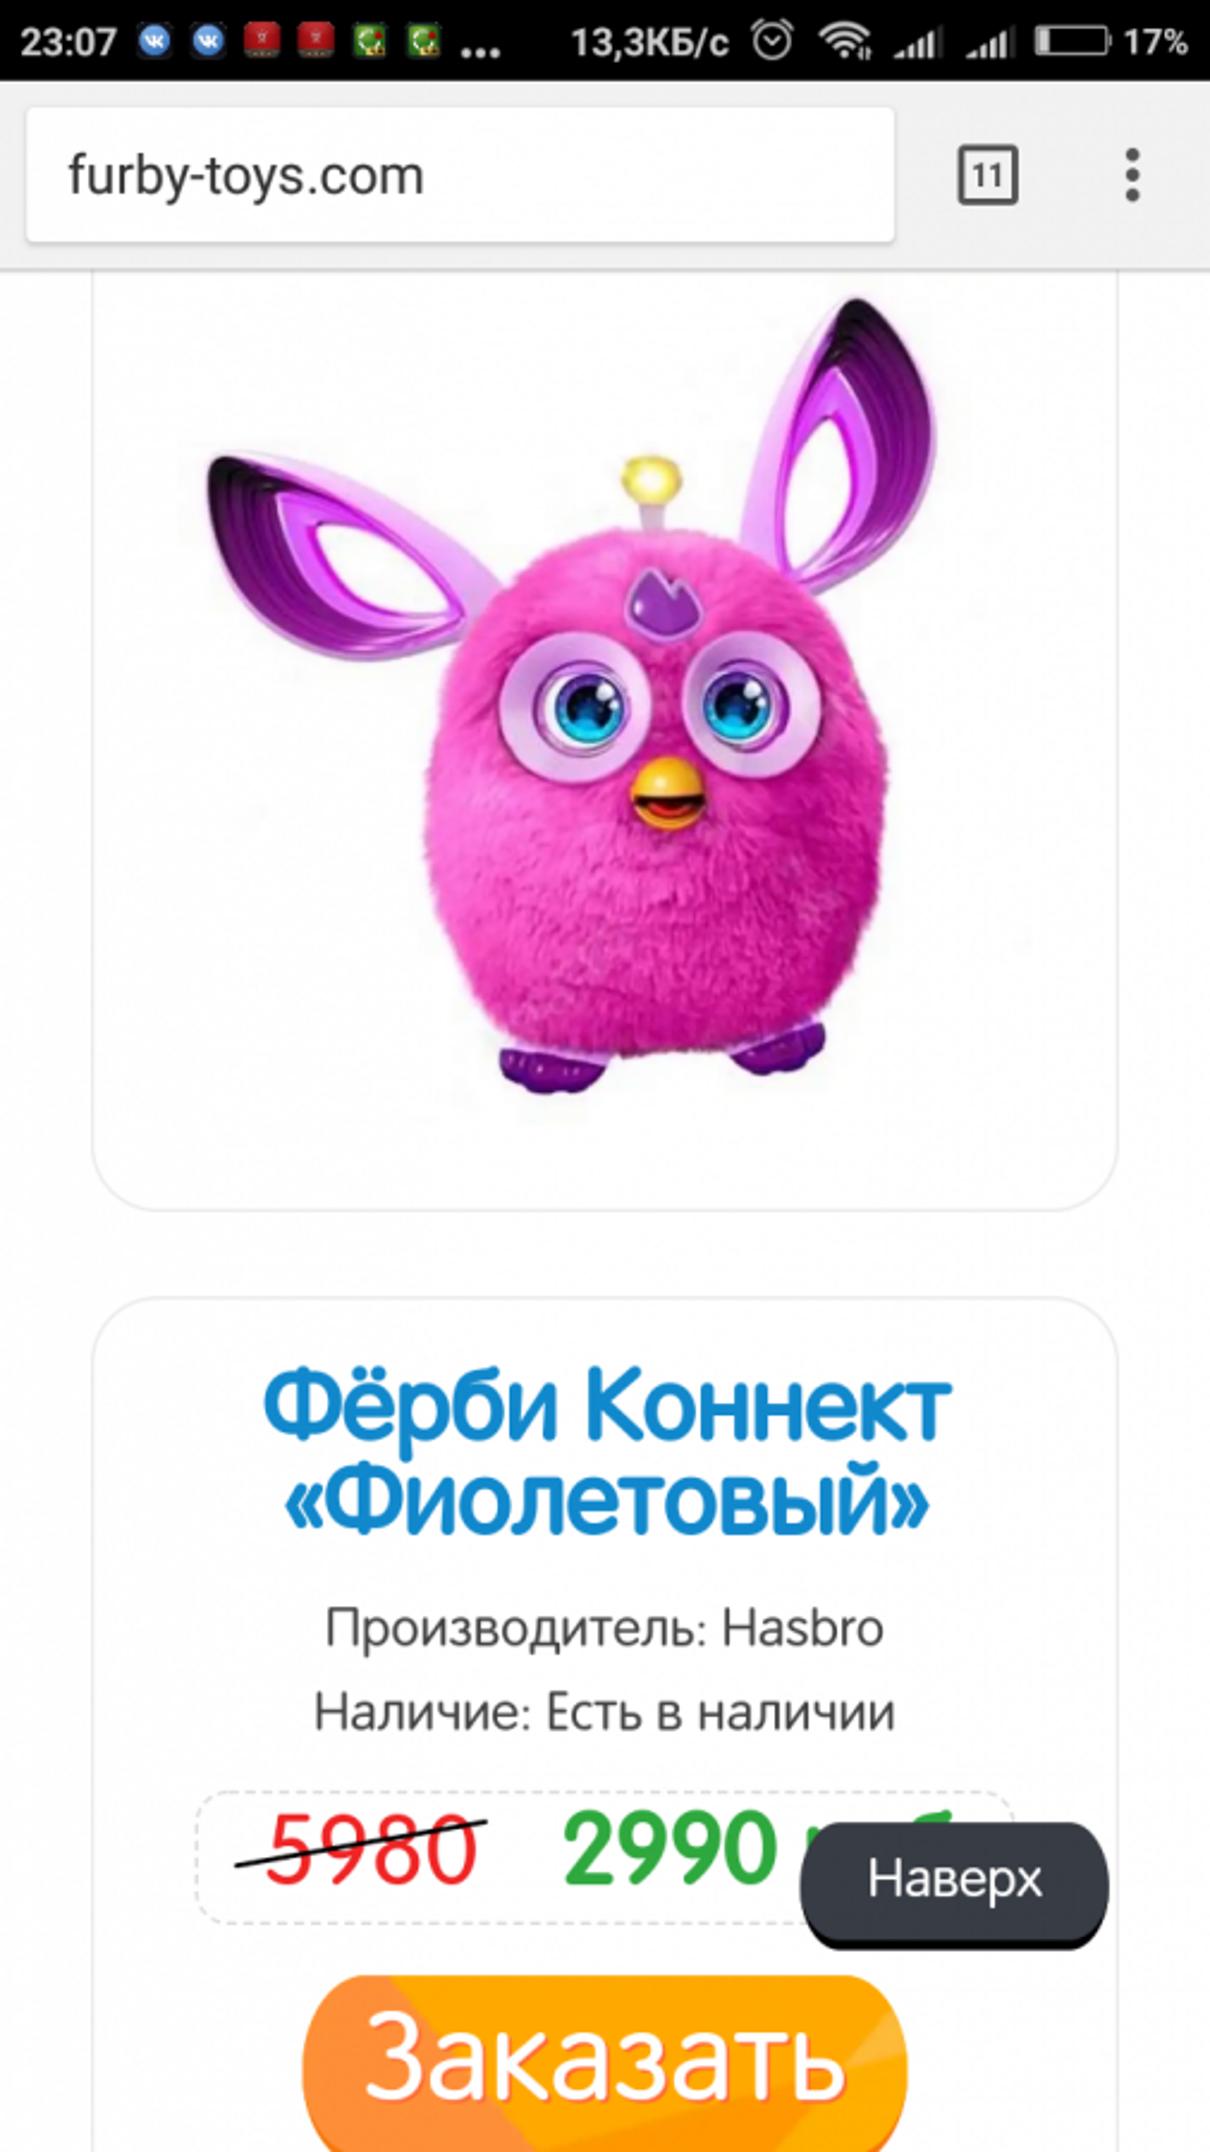 Жалоба-отзыв: Http://furby-toys.com - Мошенники